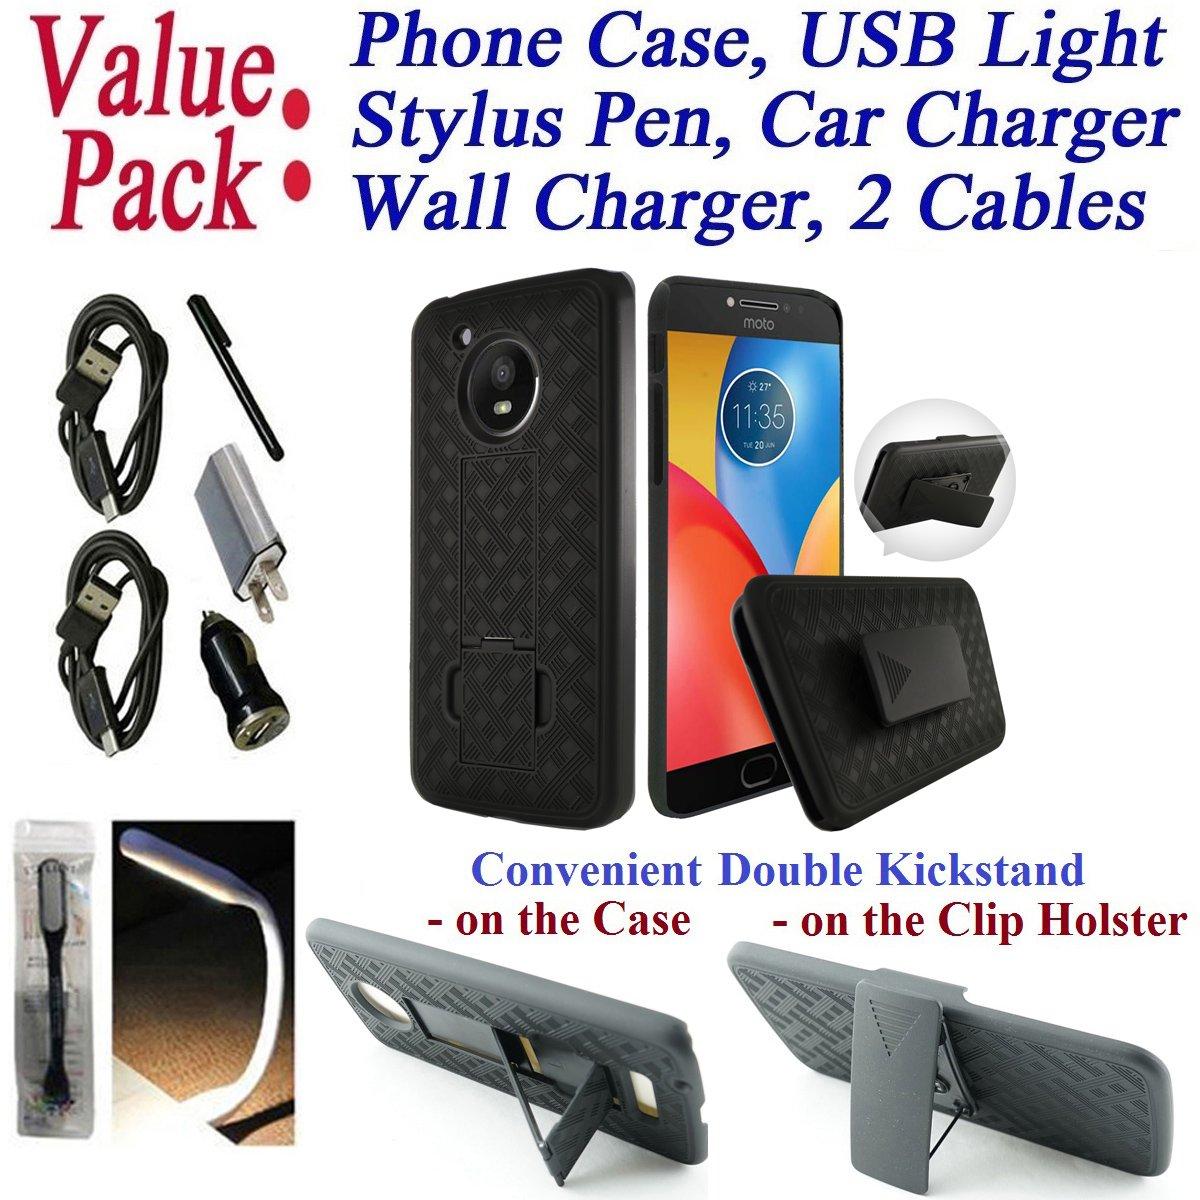 Value Pack Cables + for 5'' Motorola MOTO E4 motoe4 Case Phone Case Belt Clip Holster 2 Kick Stands Rugged Shield Slip Resistant Bumper Cover (Black)